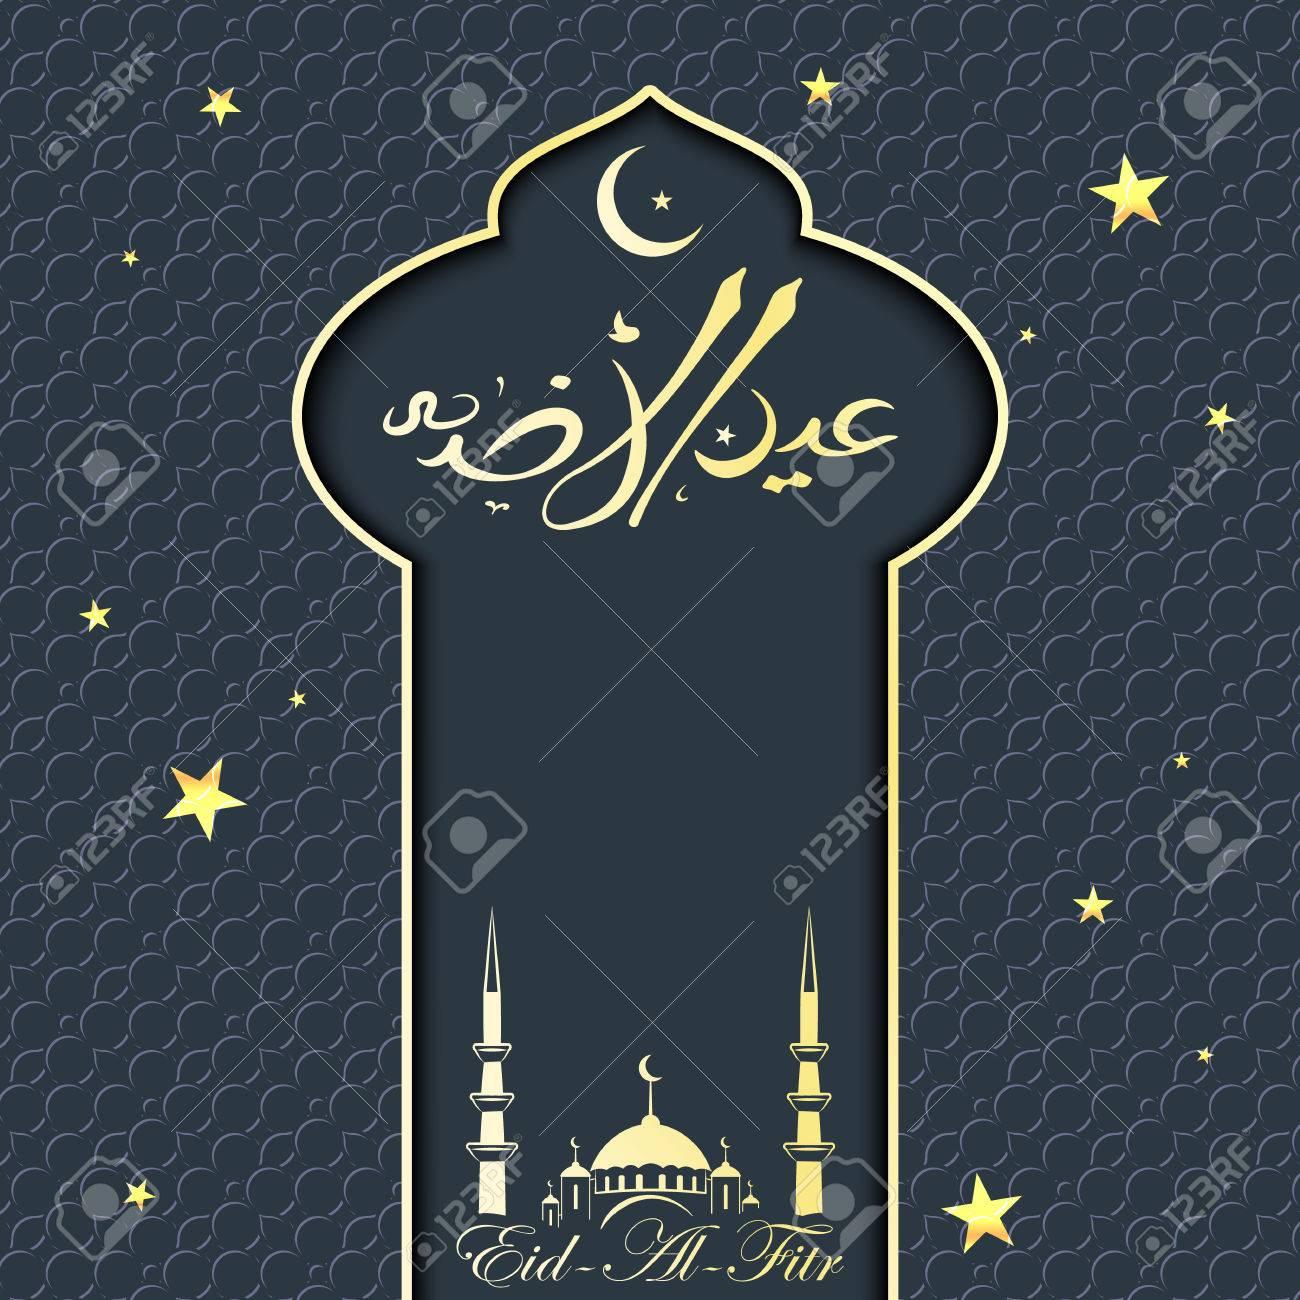 Eid al adha greeting cards religious themed background retro eid al adha greeting cards religious themed background retro arabic text eid al adha m4hsunfo